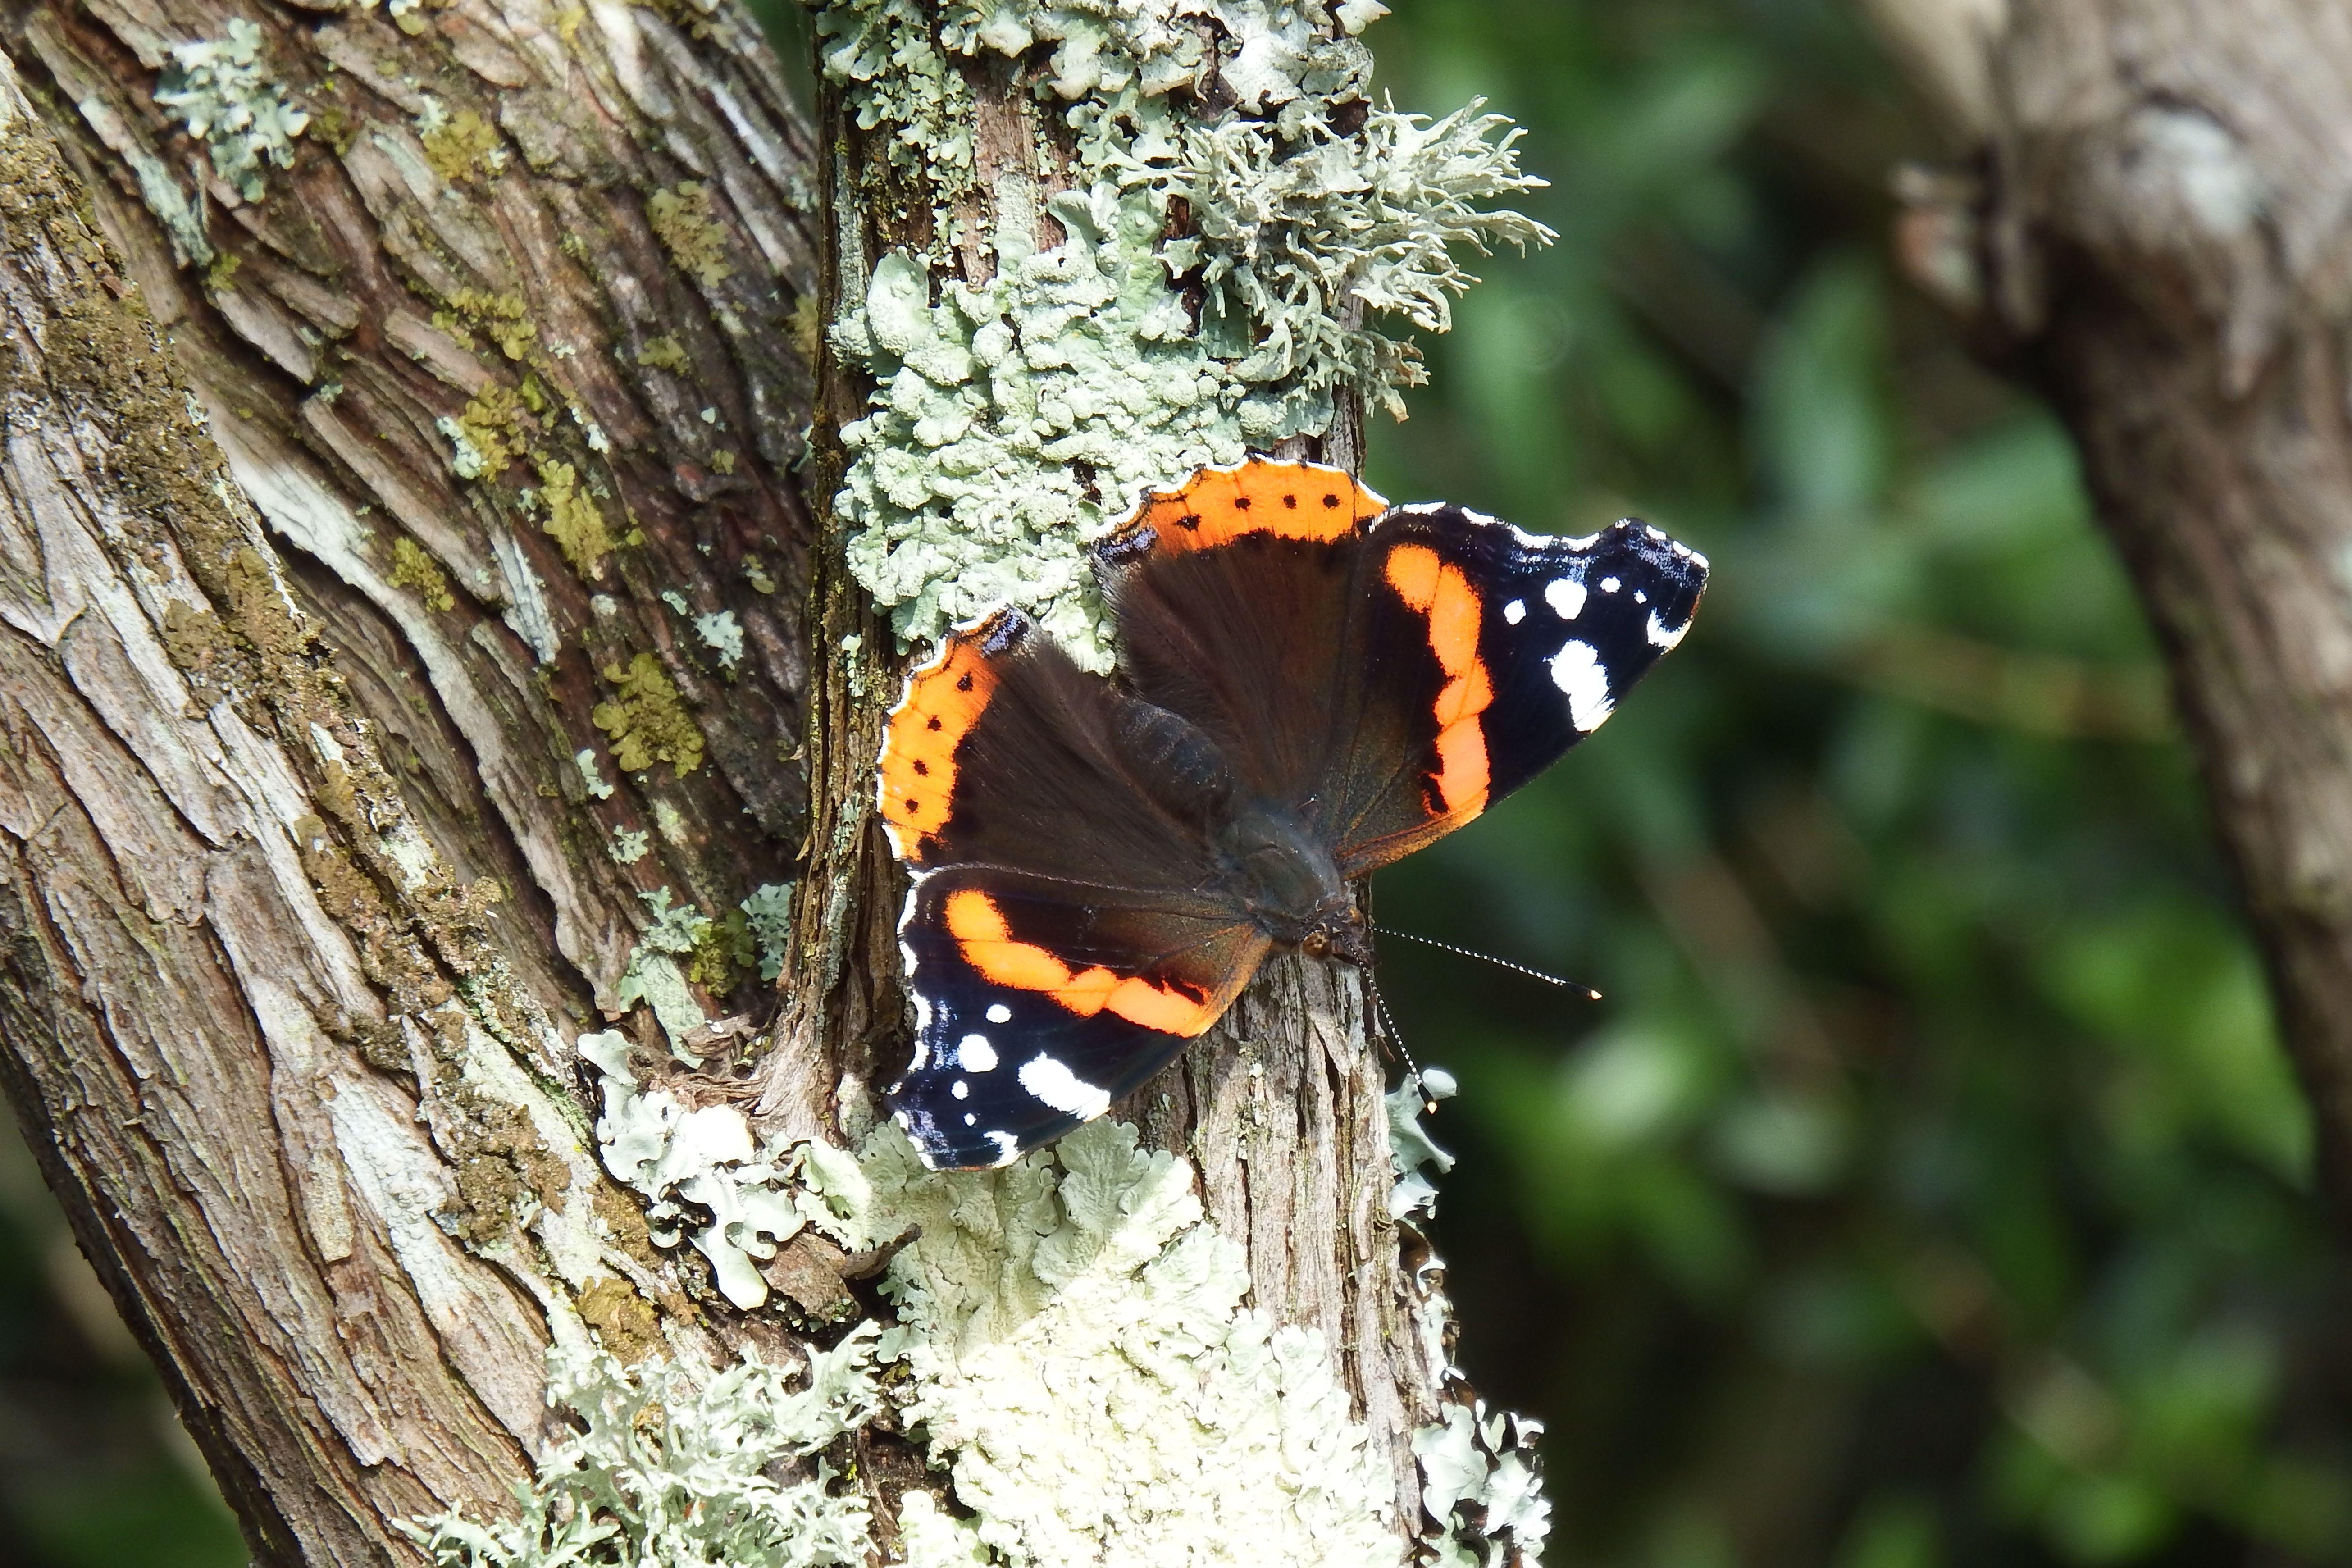 Garden Trees That Attract Butterflies